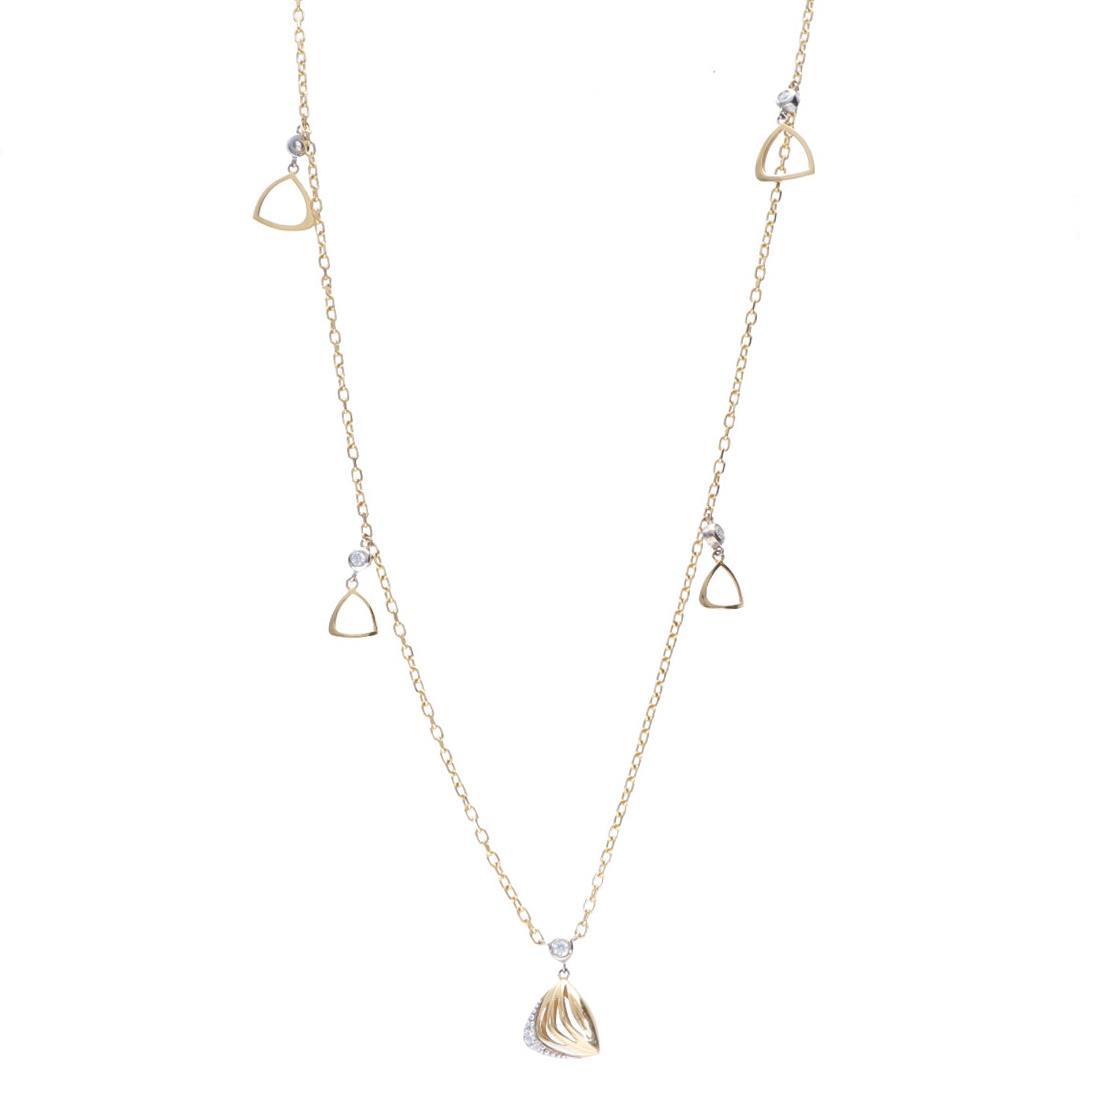 Long necklace with diamonds - ALFIERI & ST. JOHN